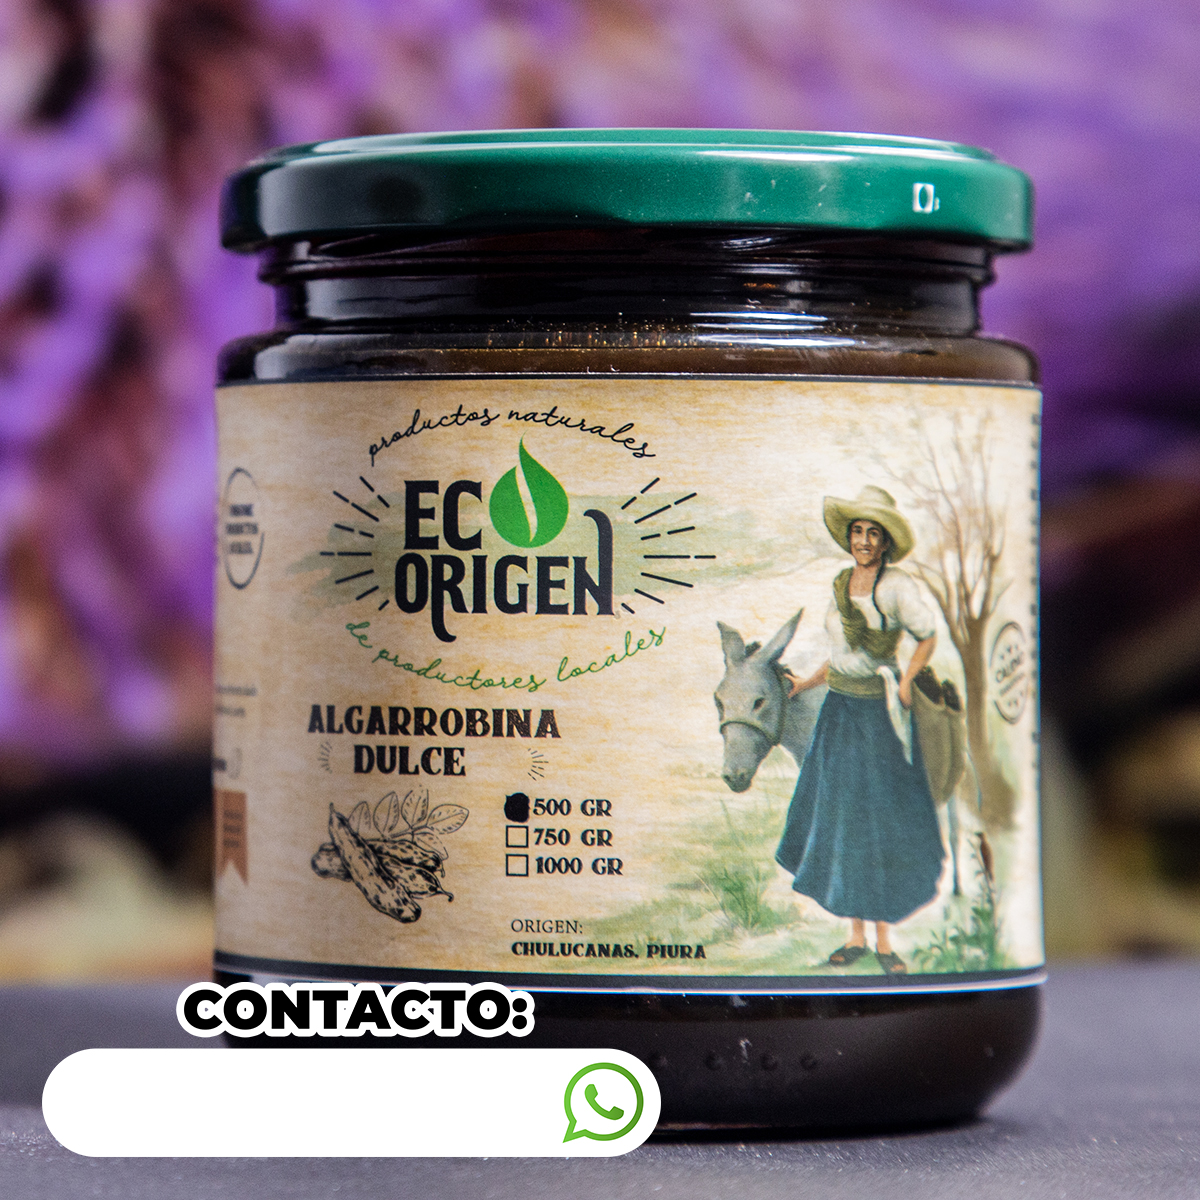 Algarrobina dulce x 500 gr Eco Origen